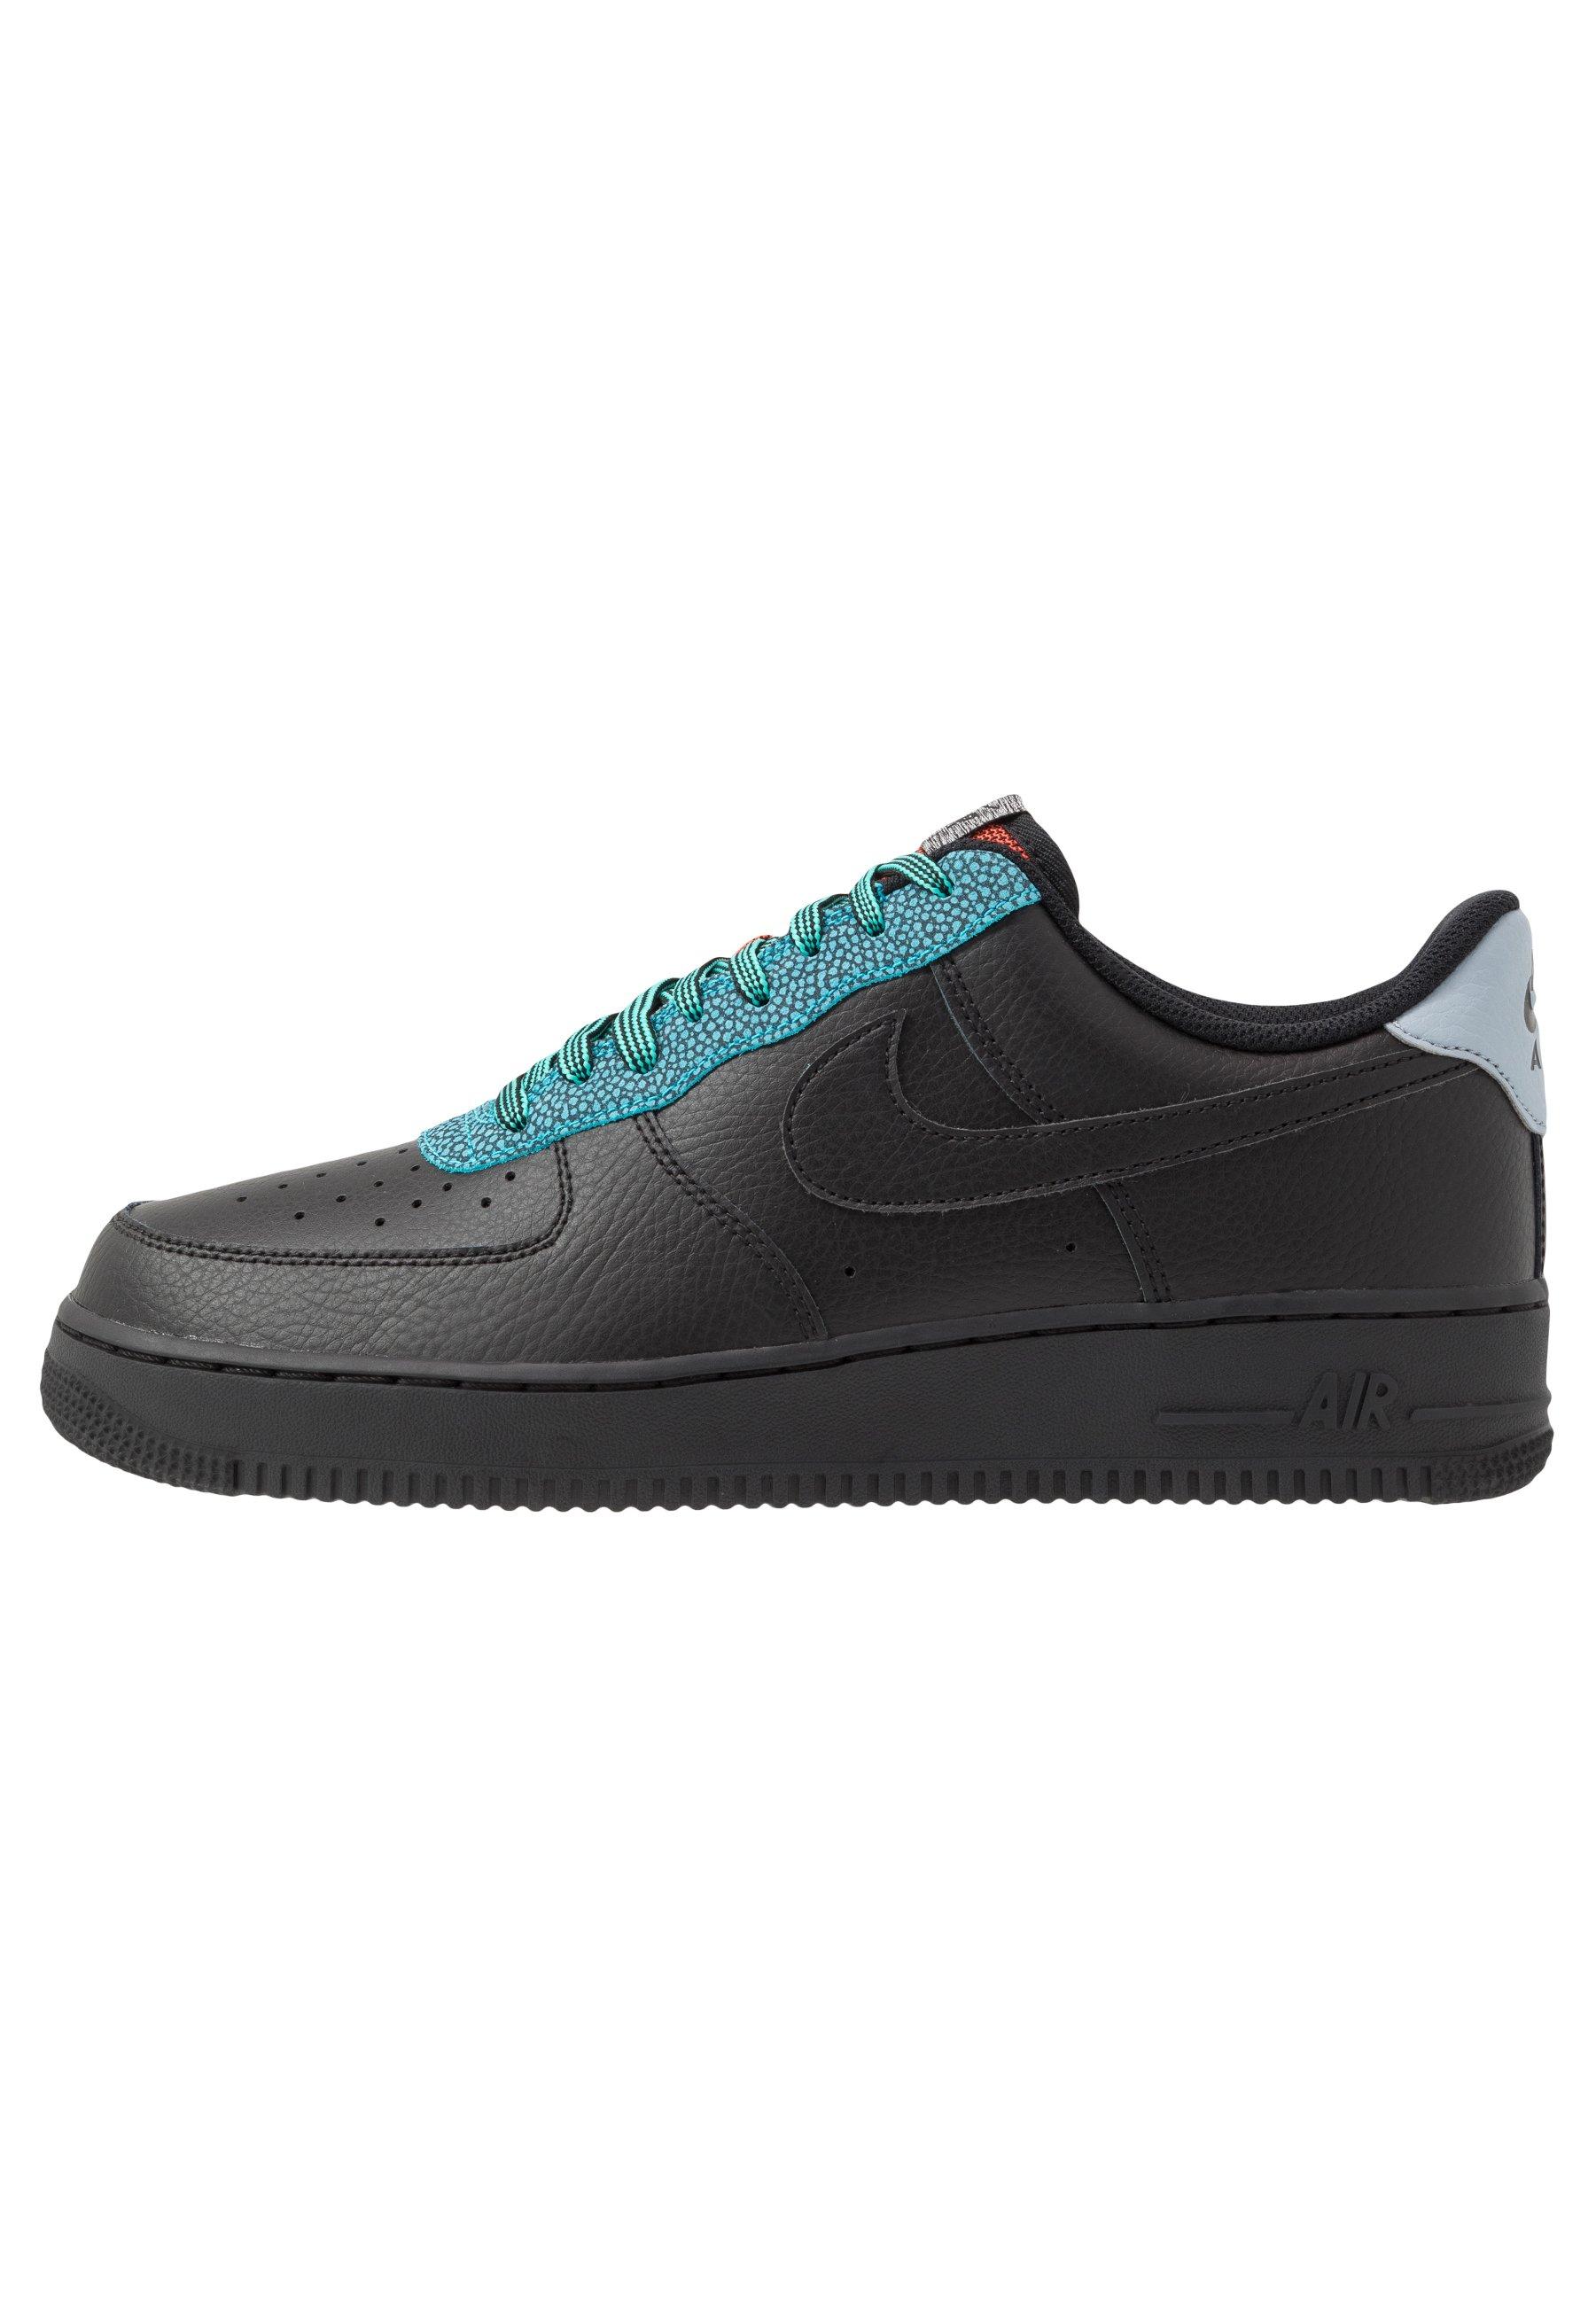 Scarpe e sneaker da uomo Nike Air Force 1 '07 Lv8 1 Obsidian